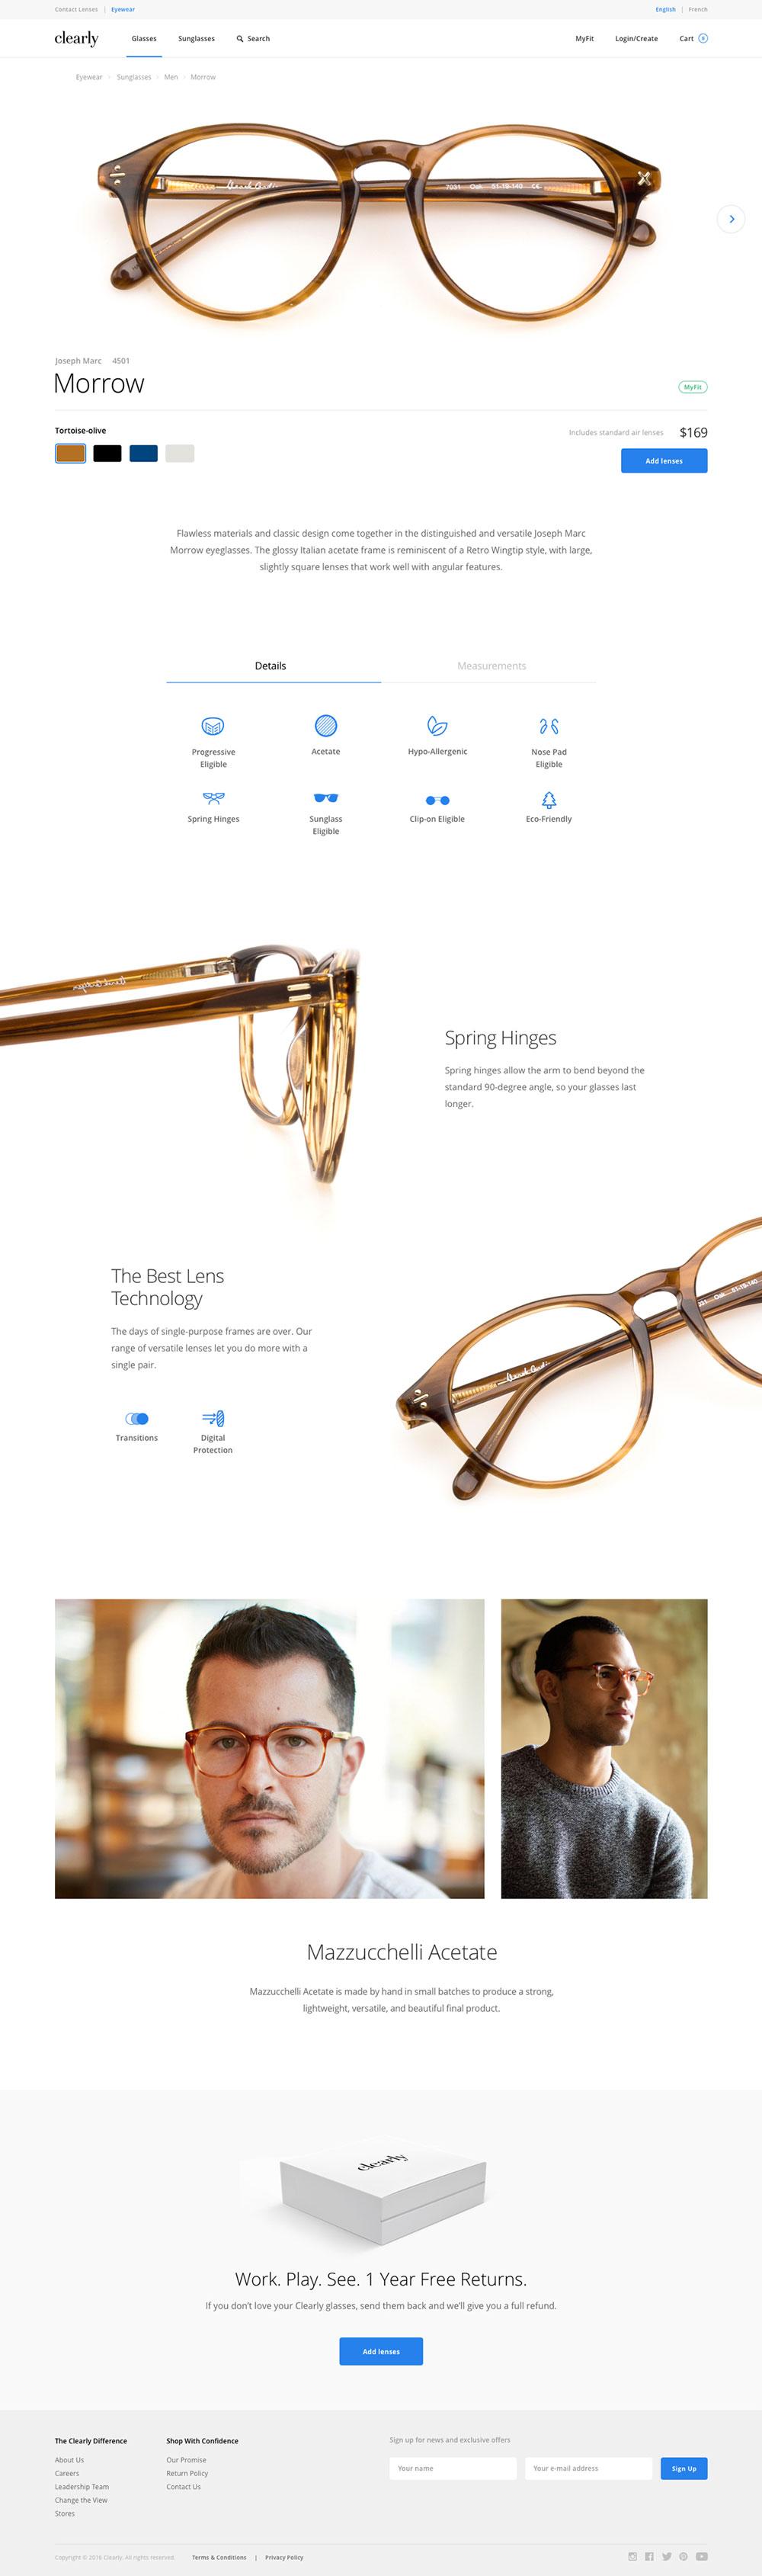 Web-Design-Inspiration-Week-No-39-005